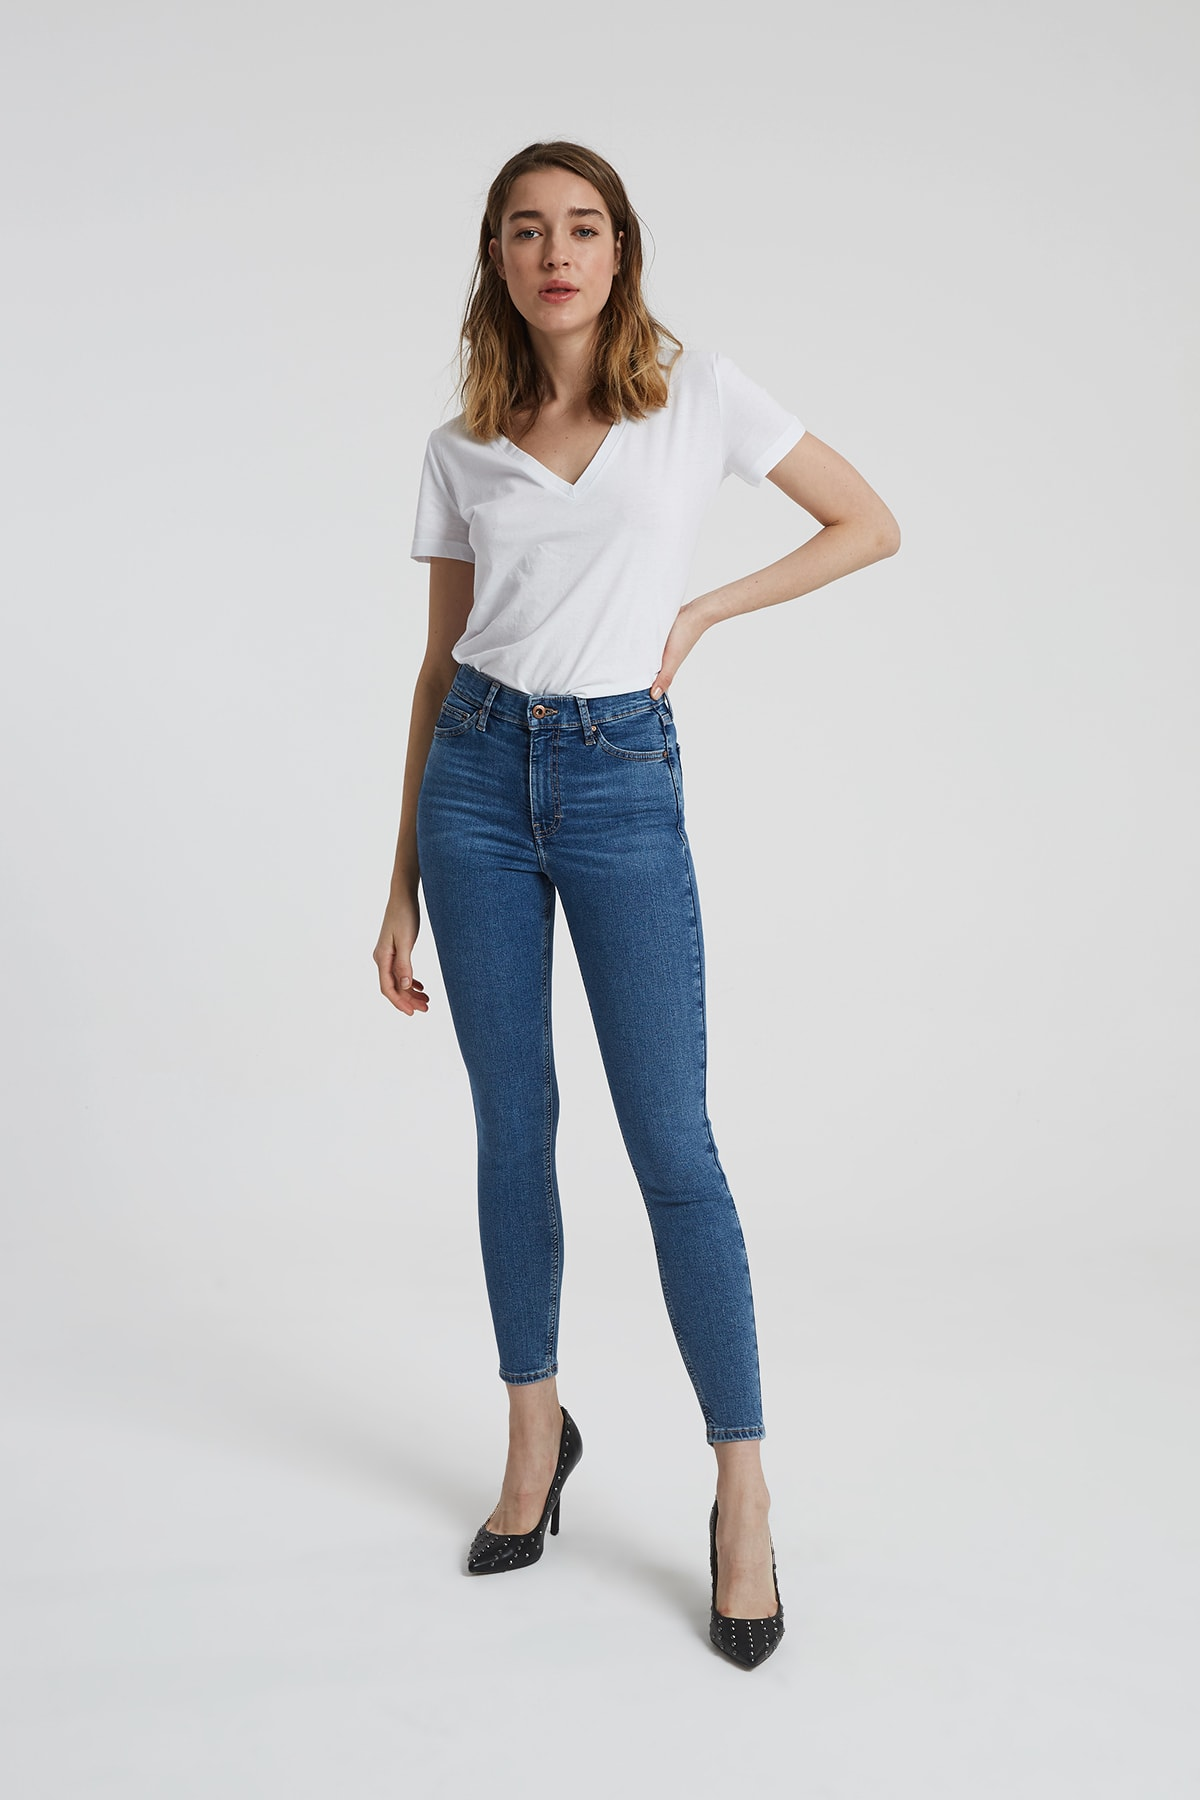 CROSS JEANS Judy Orta Taş Indigo Yüksek Bel Skinny Fit Jean Pantolon 1